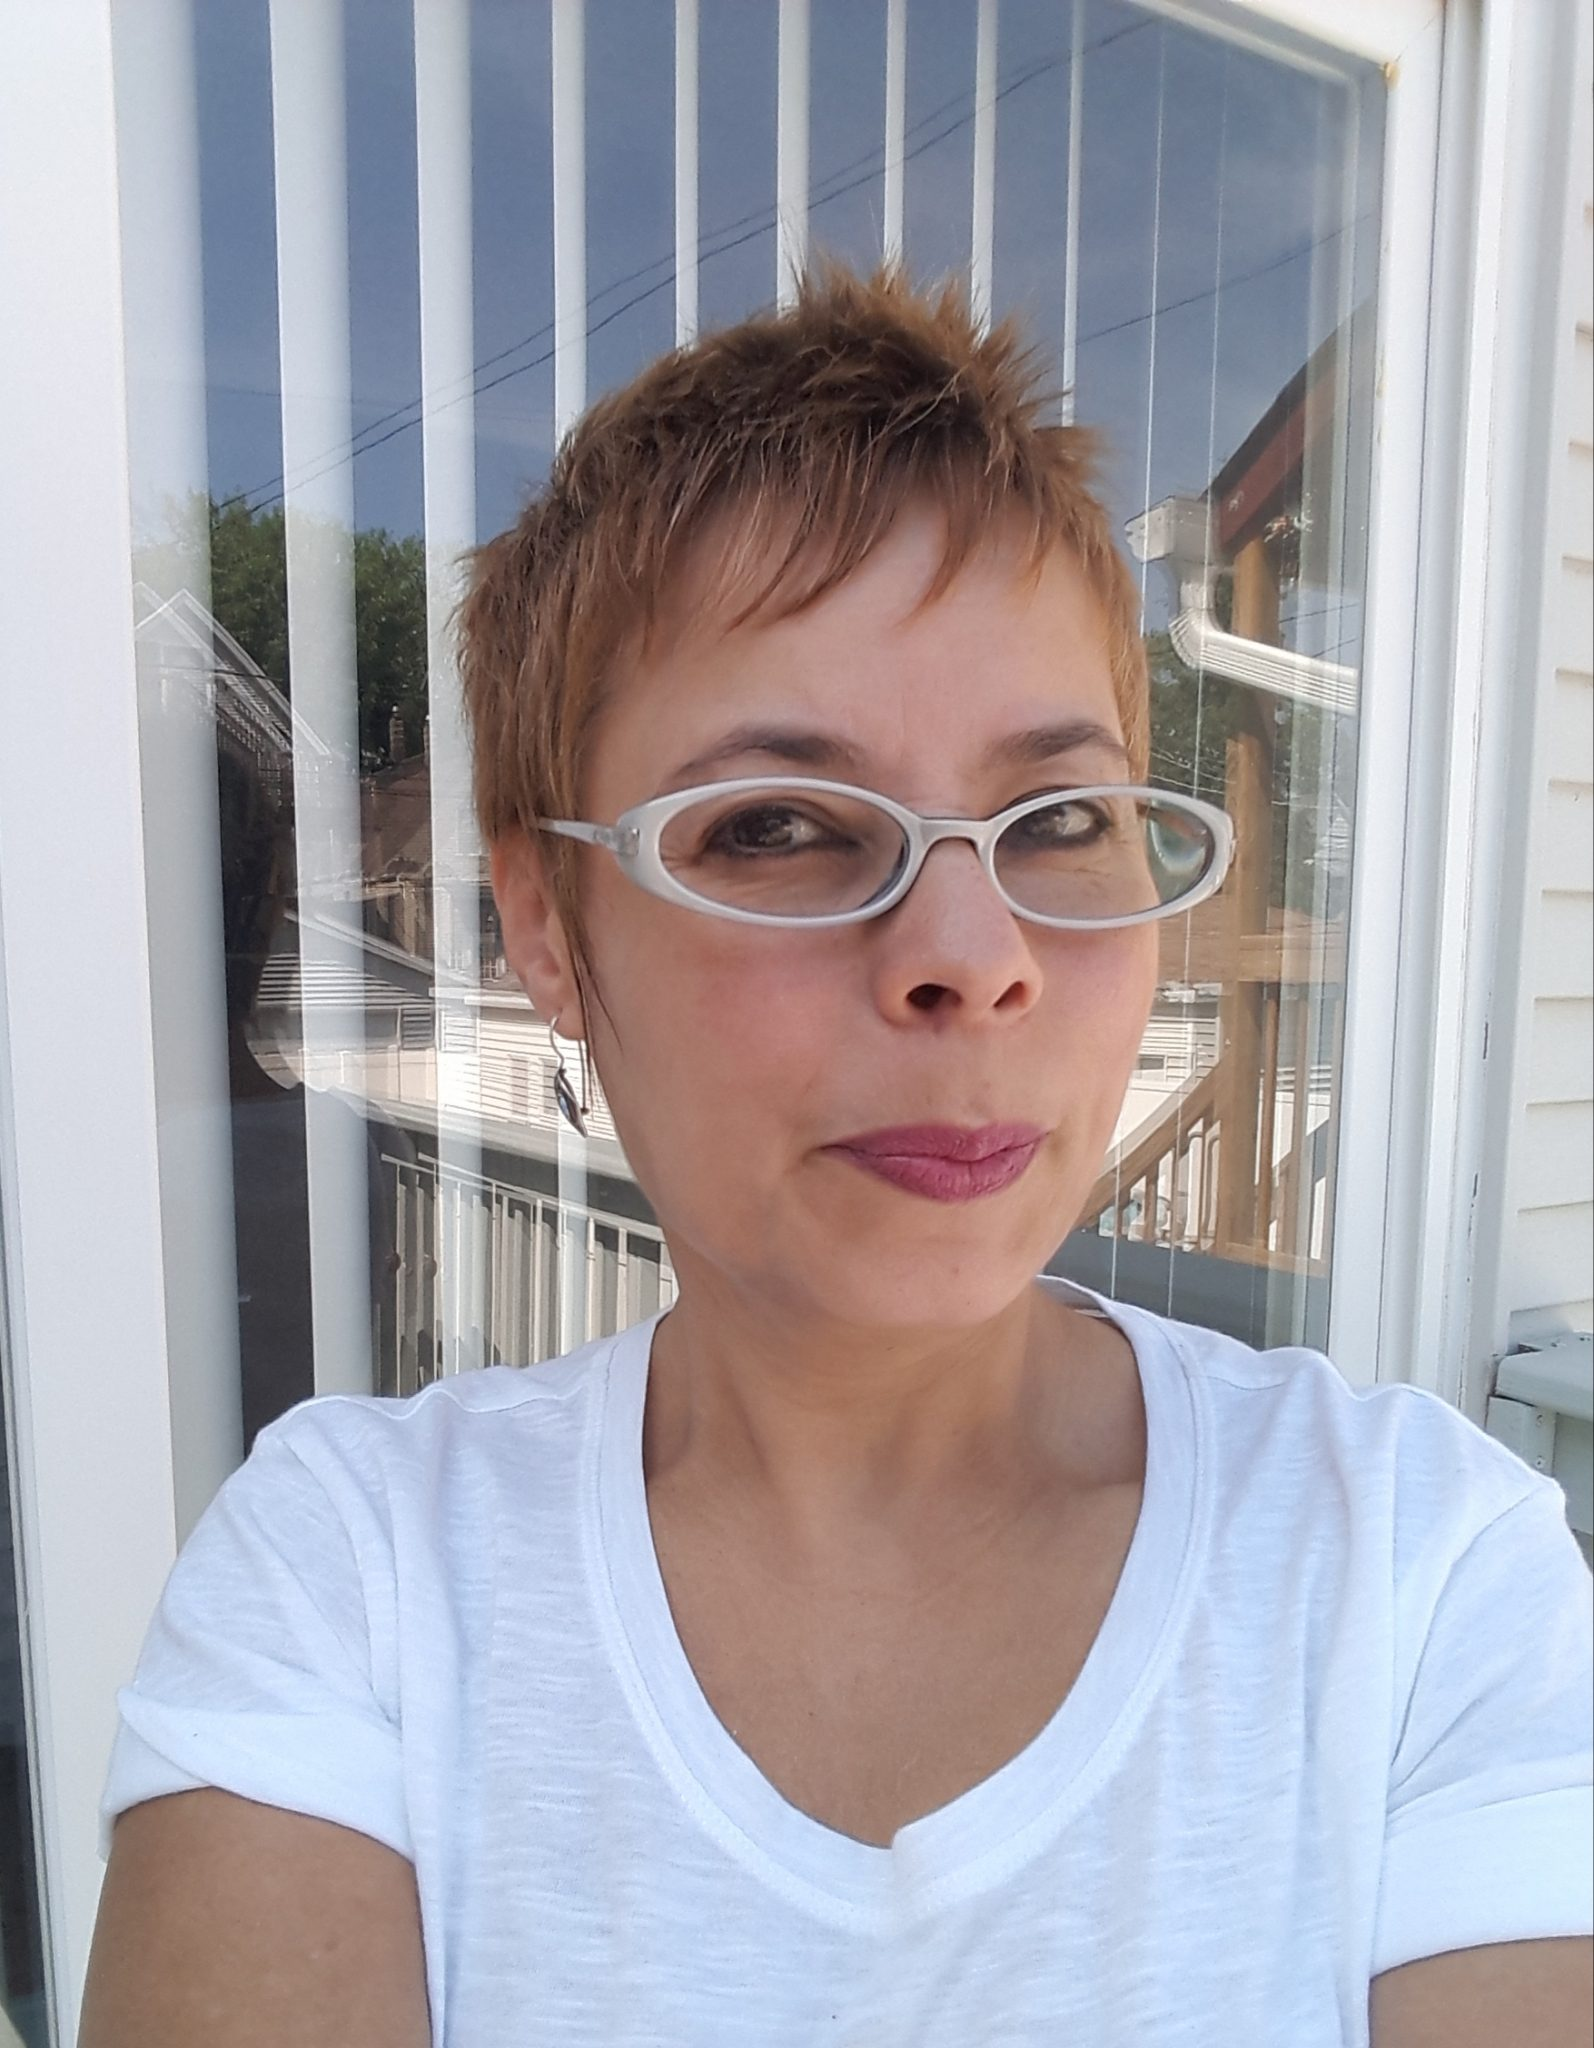 Full Name: Meet Neysa Riverea